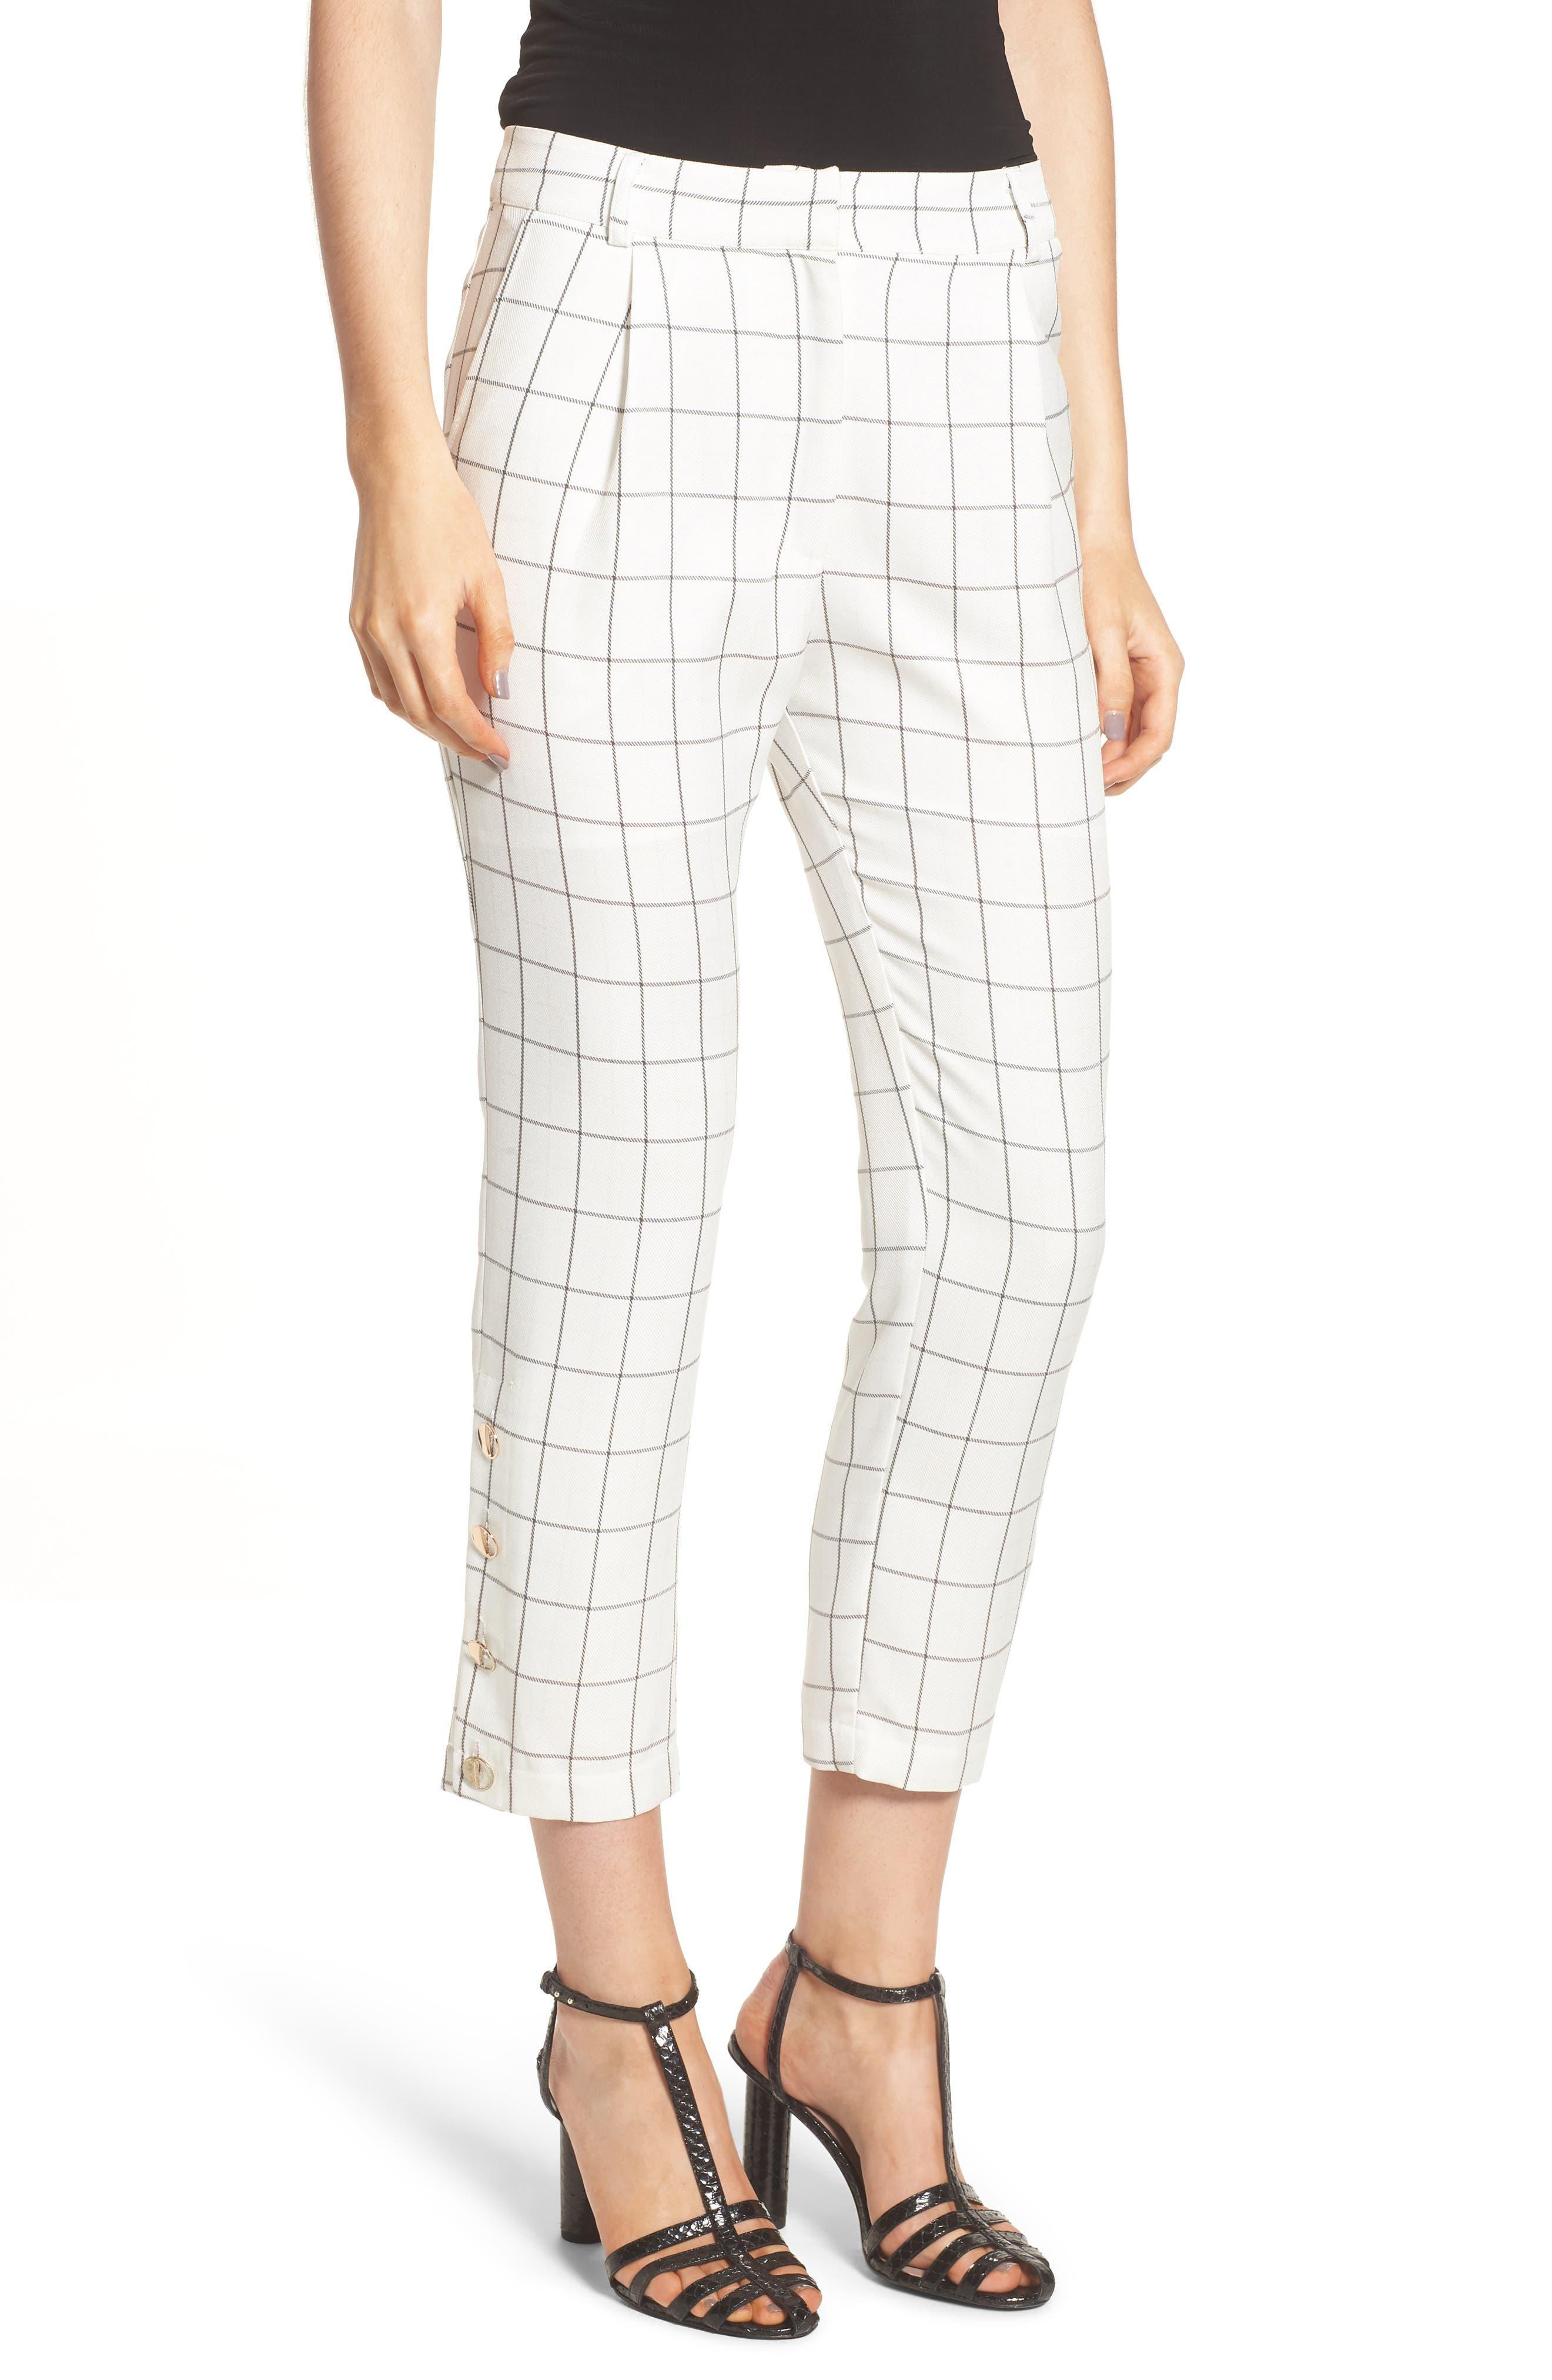 Main Image - Chriselle x J.O.A. High Waist Ankle Skinny Trousers